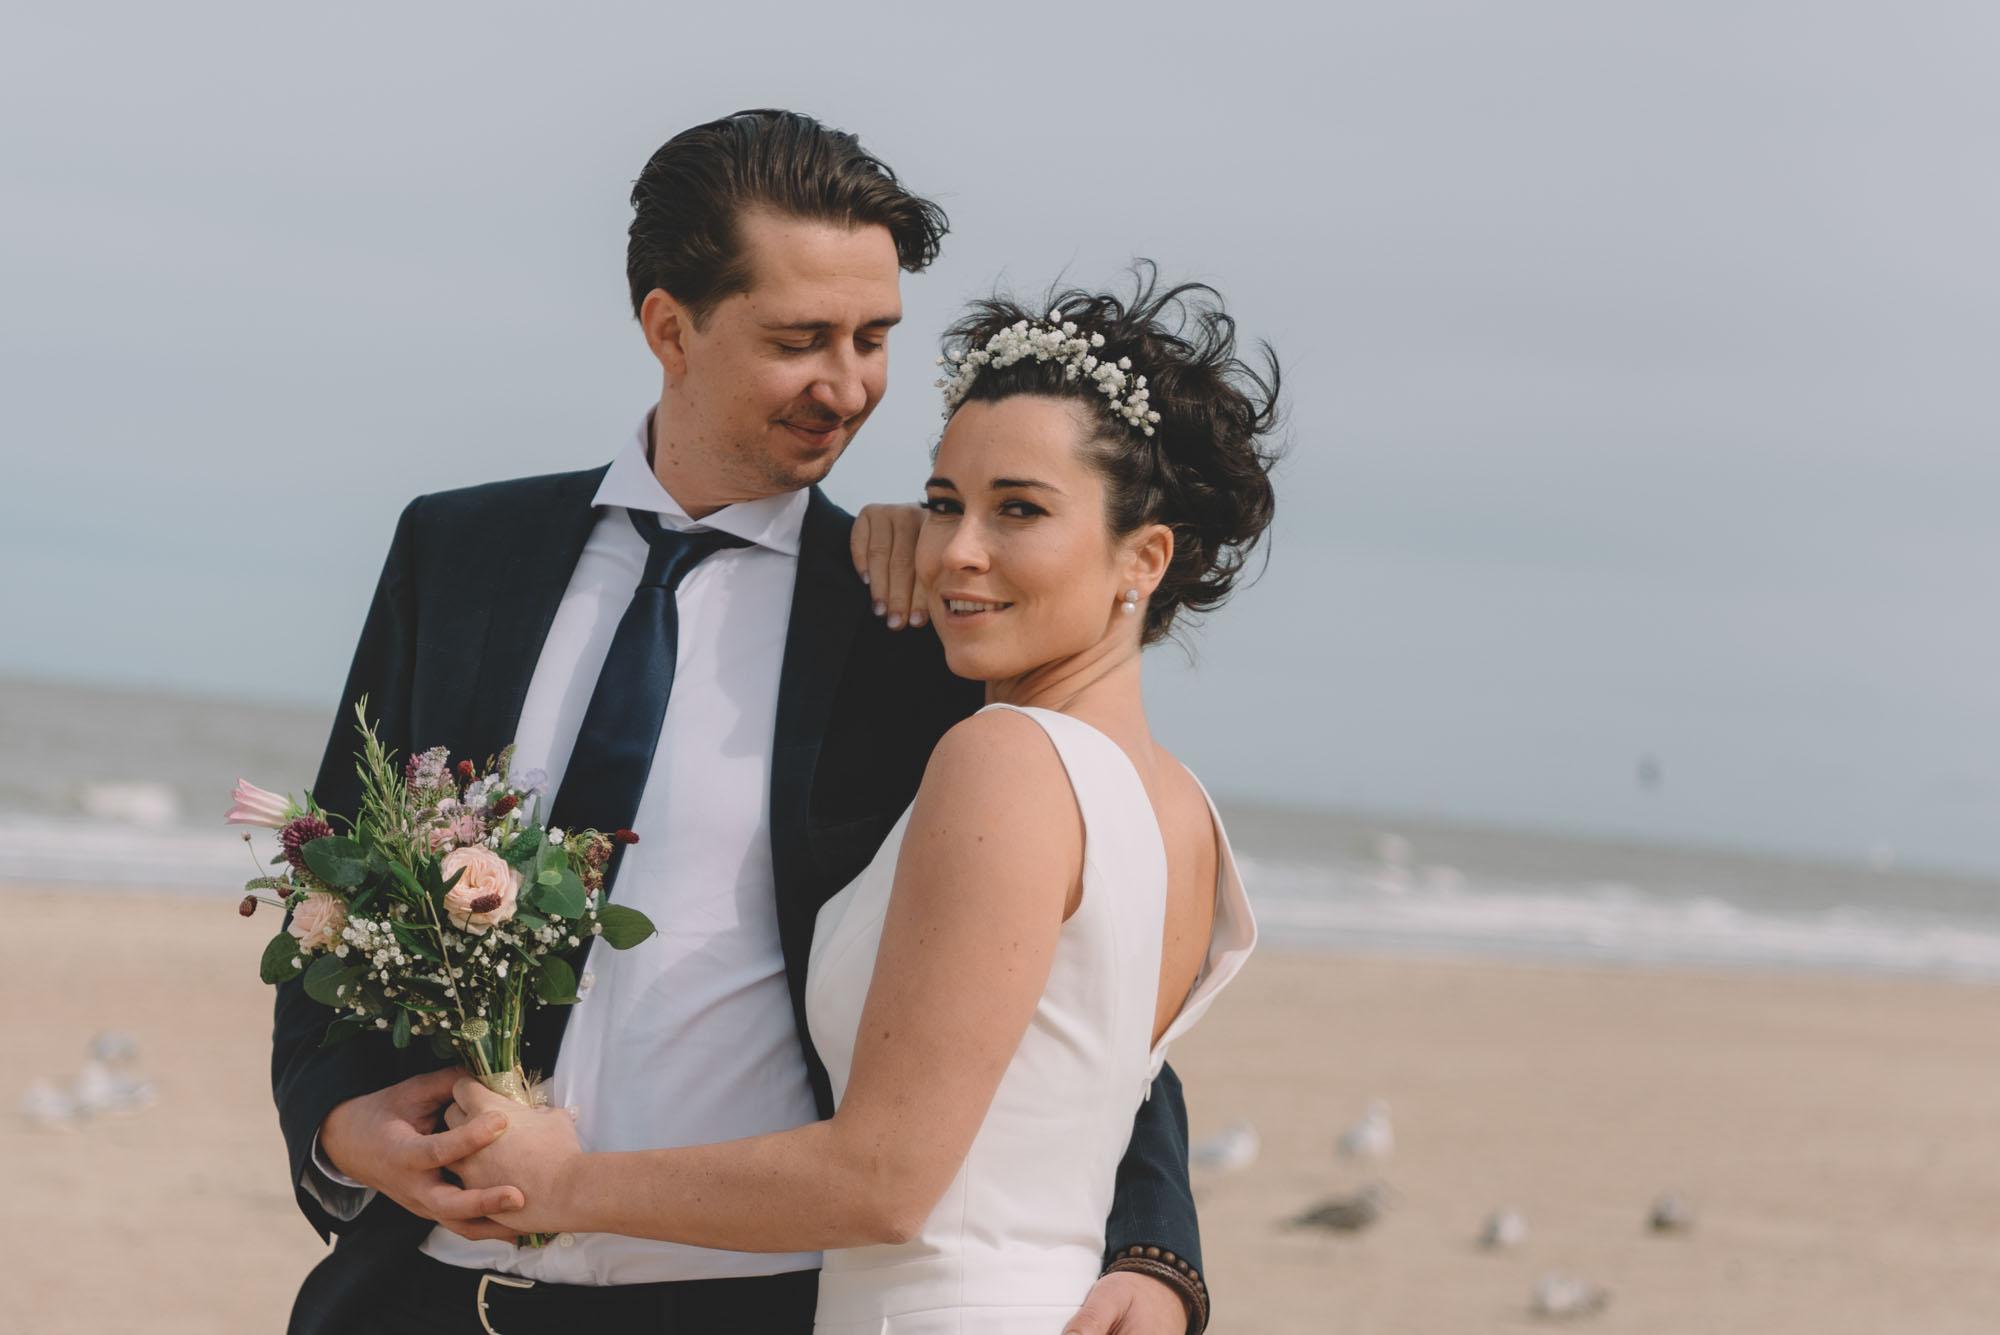 Bruidsfotograaf West-Vlaanderen